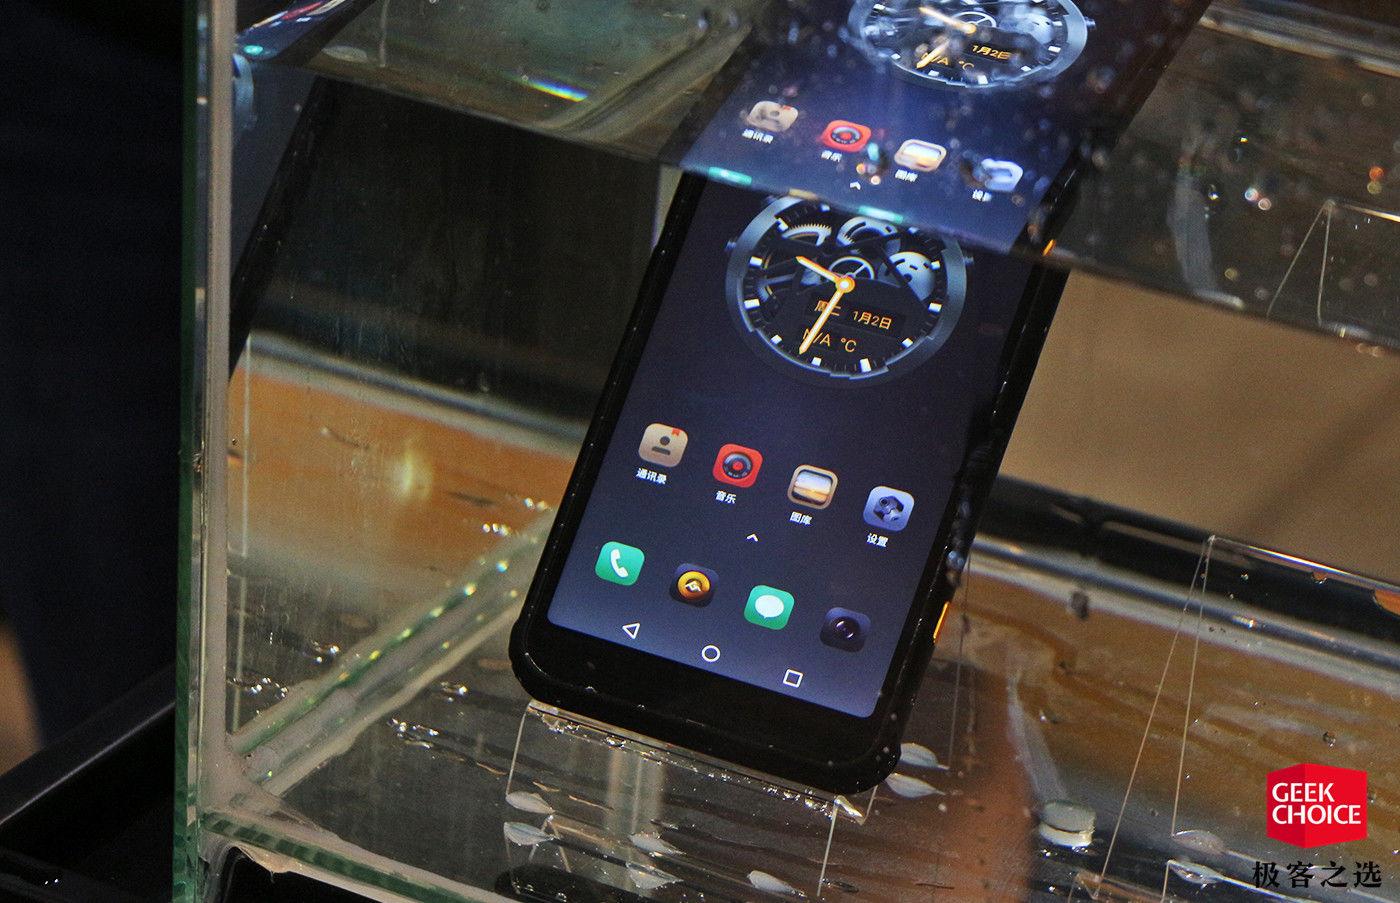 AGM X3 smart phone